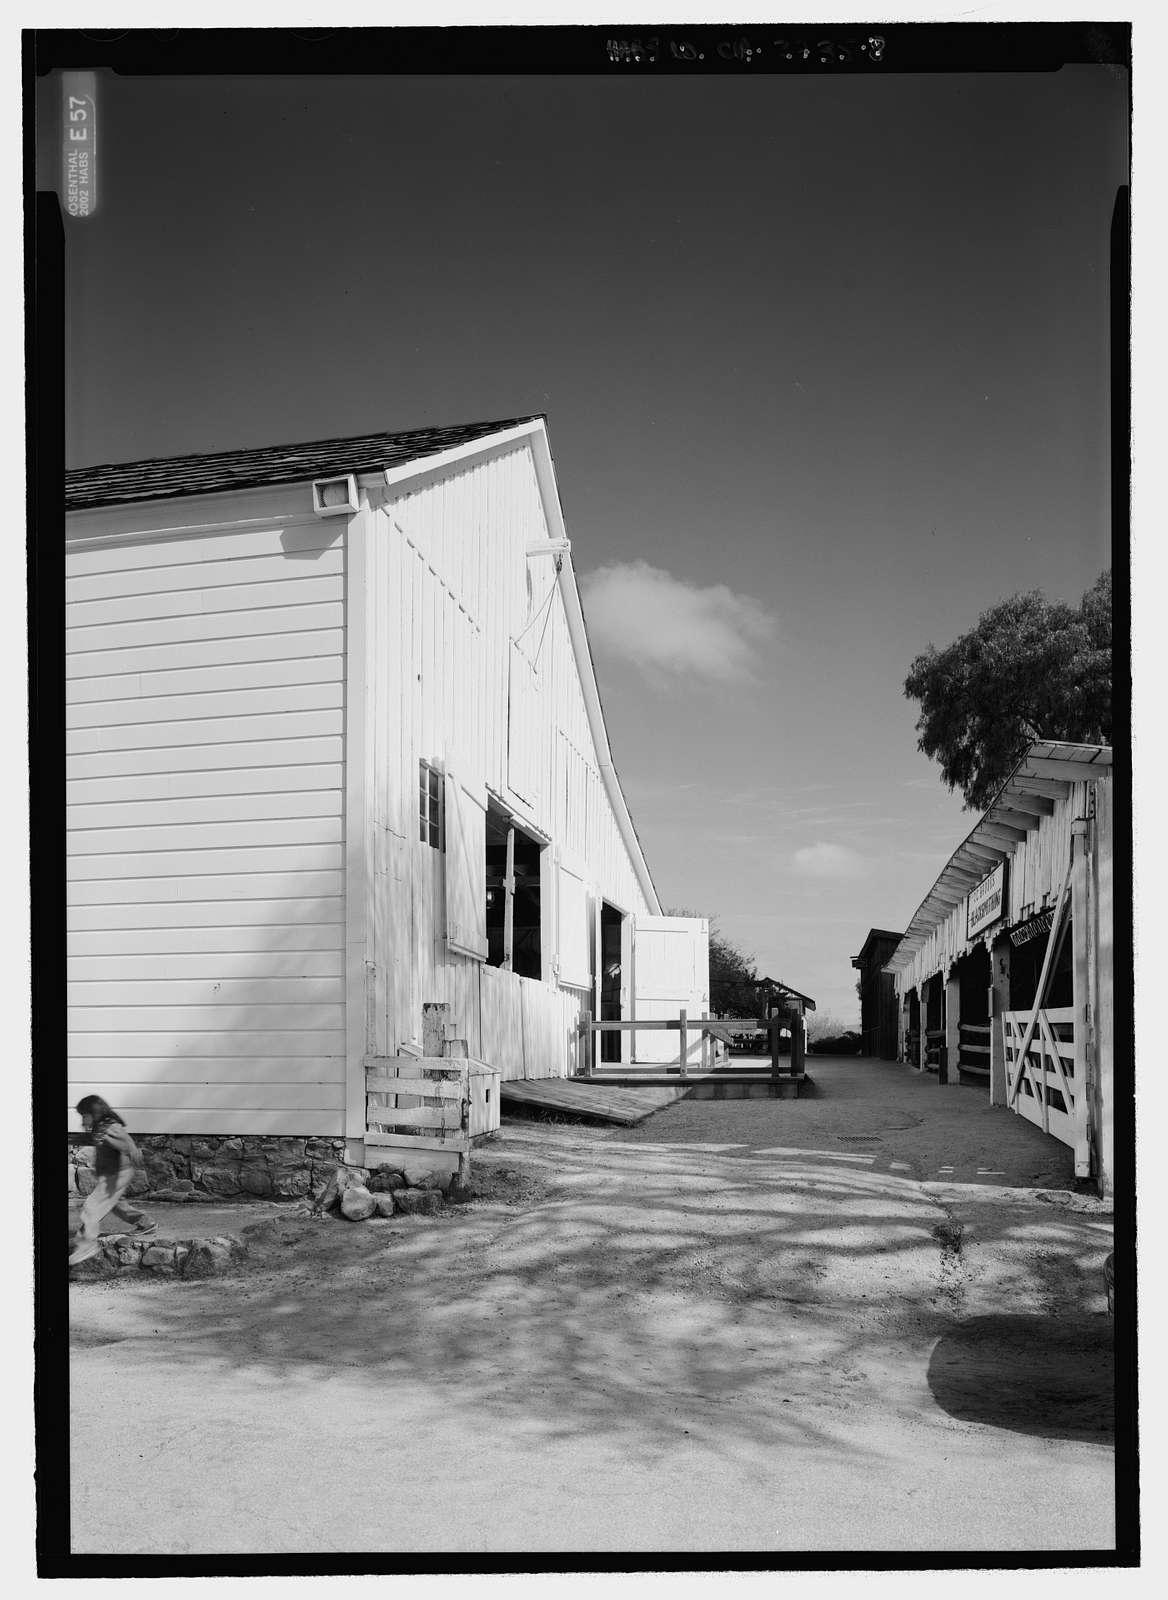 Livery-Plaza Stable, San Juan Bautista, San Benito County, CA